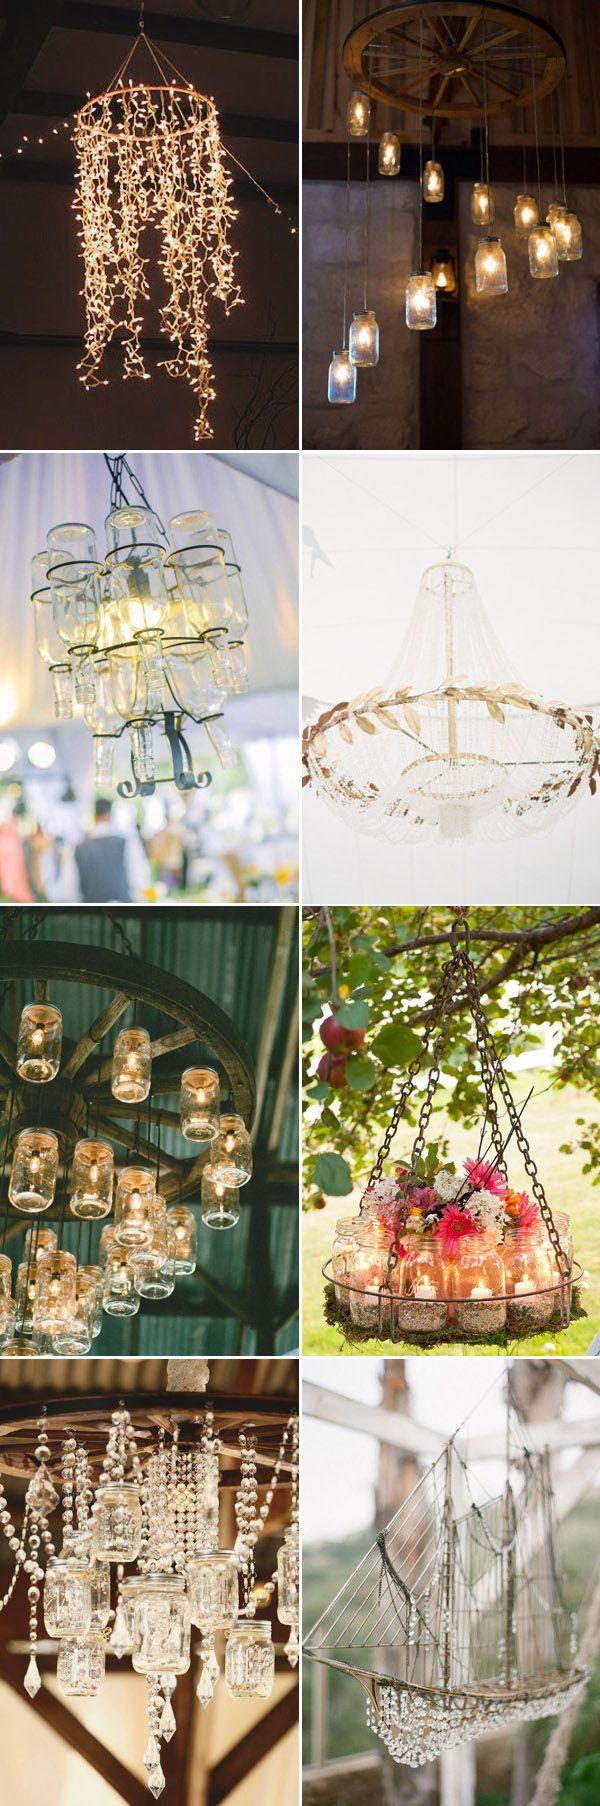 1000 Ideas About Diy Chandelier On Pinterest Handmade